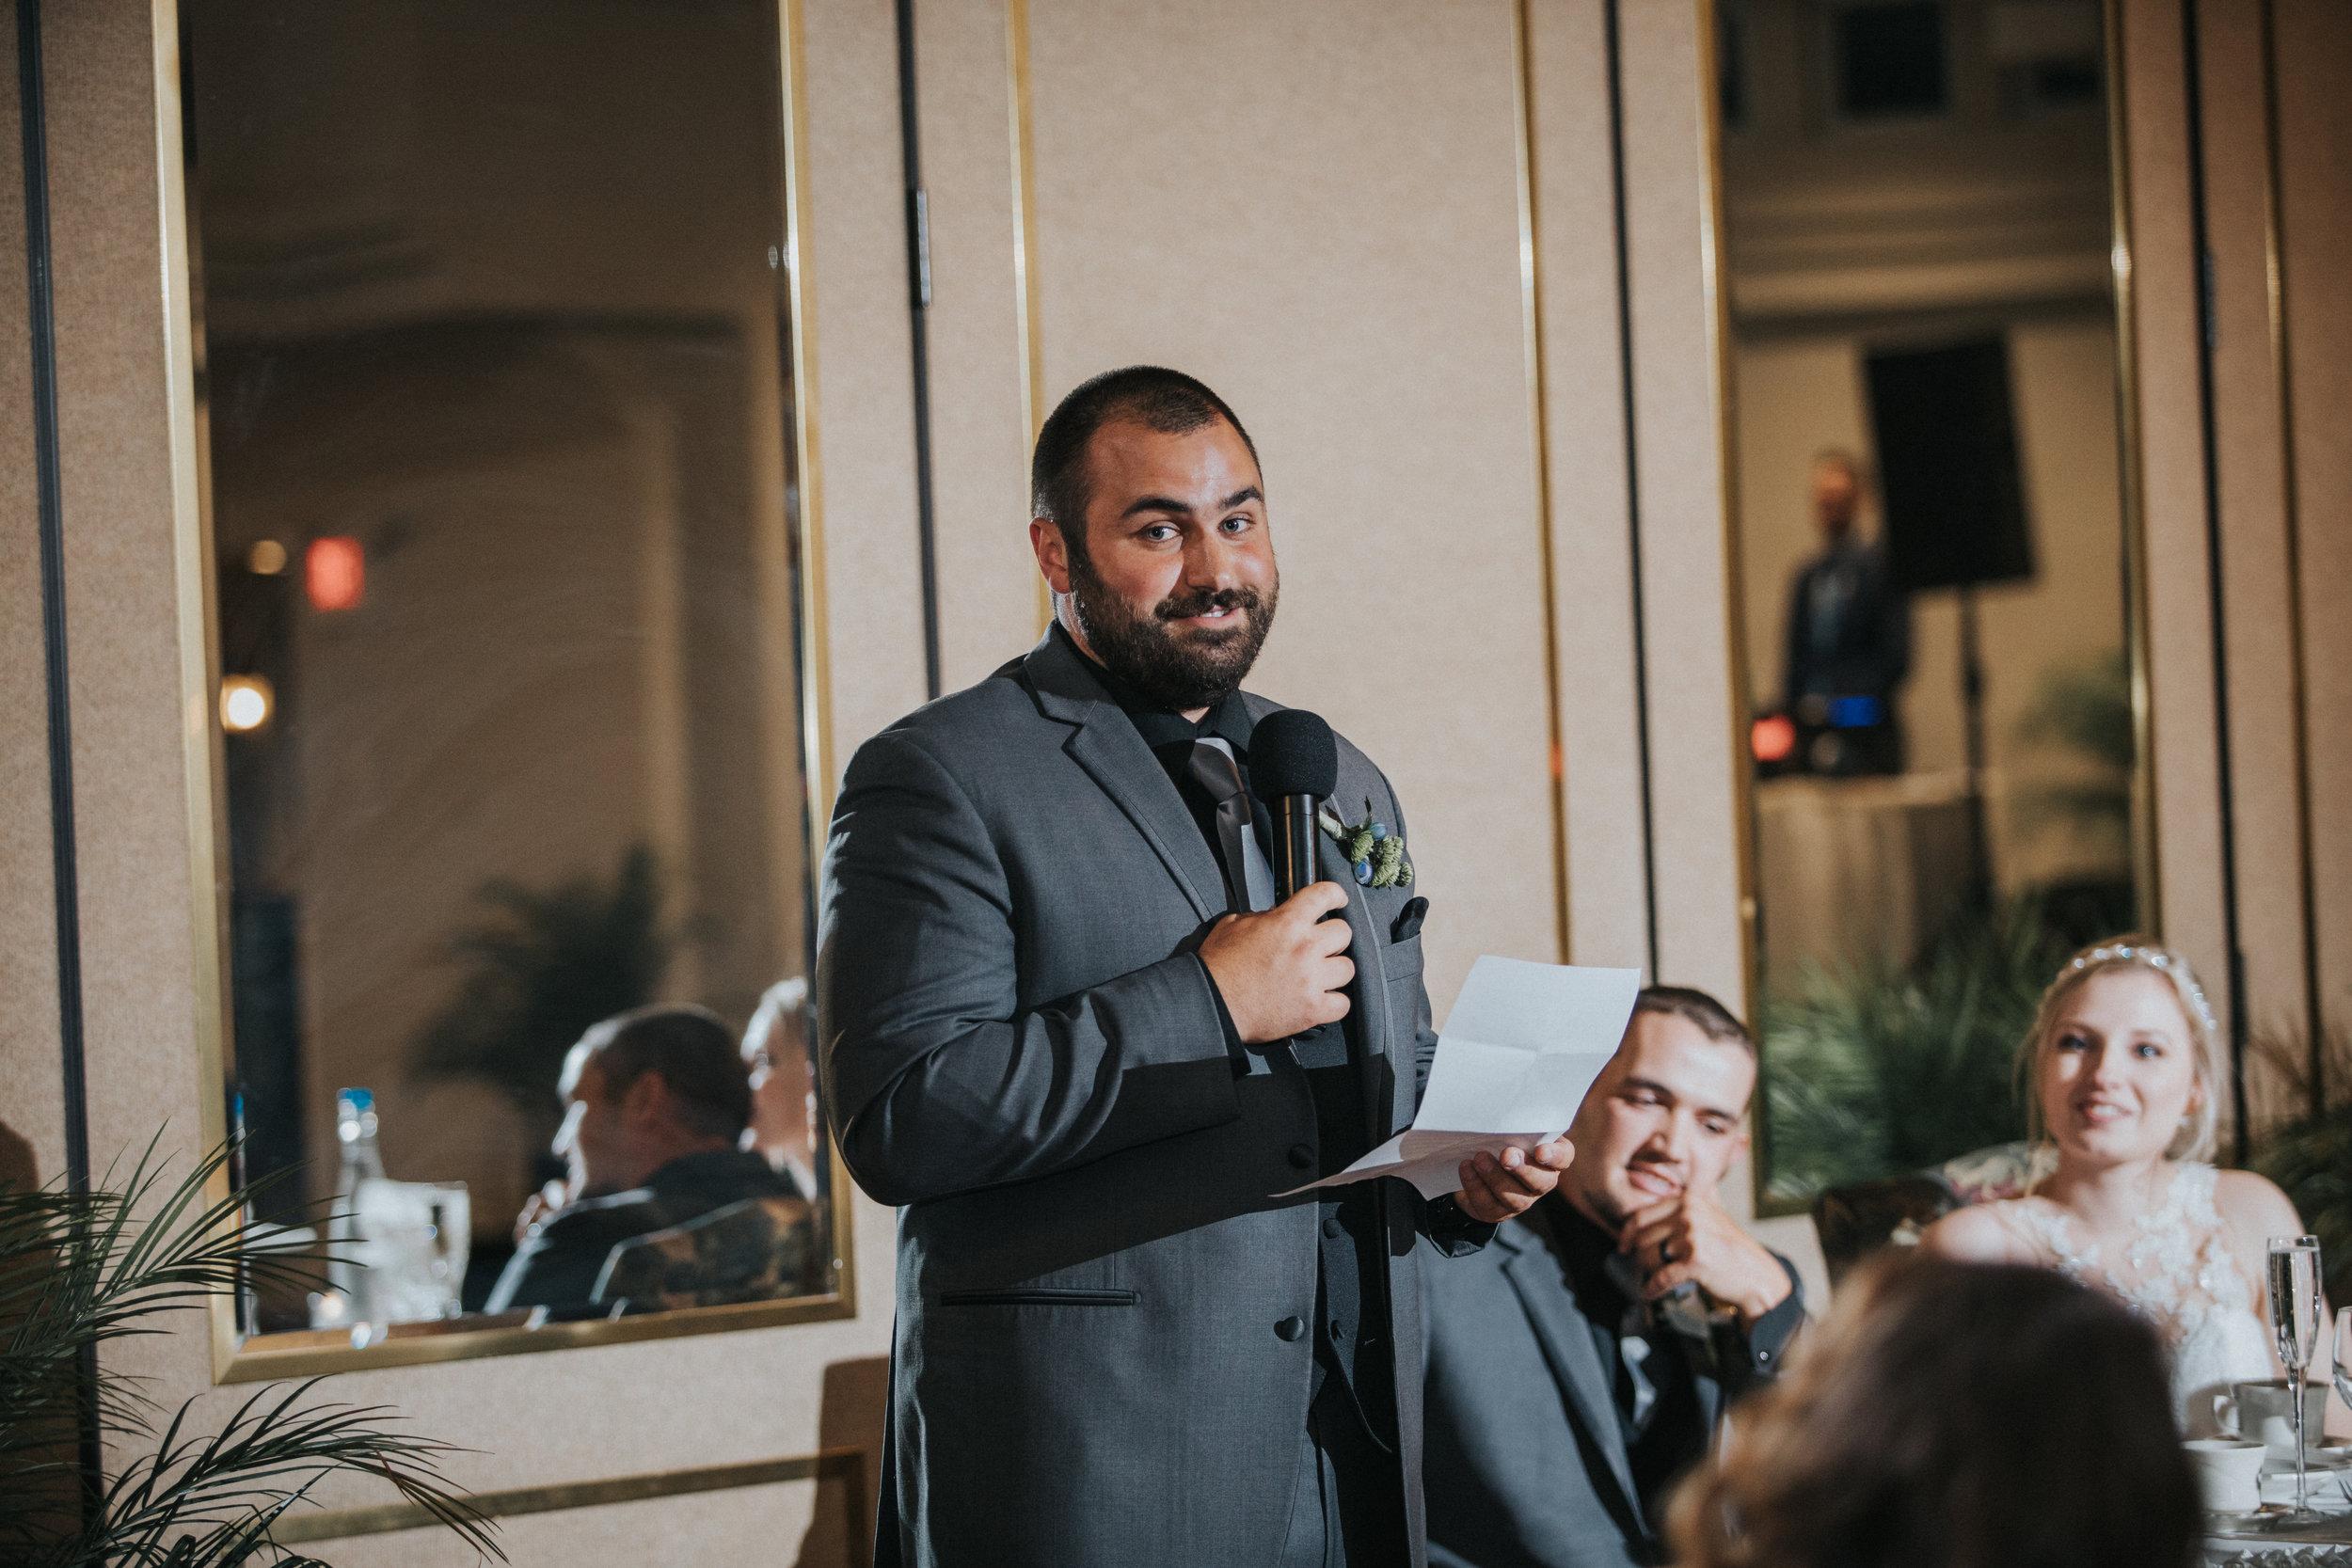 New-Jersey-Wedding-Photographer-Megan&Nick-Reception-75.jpg